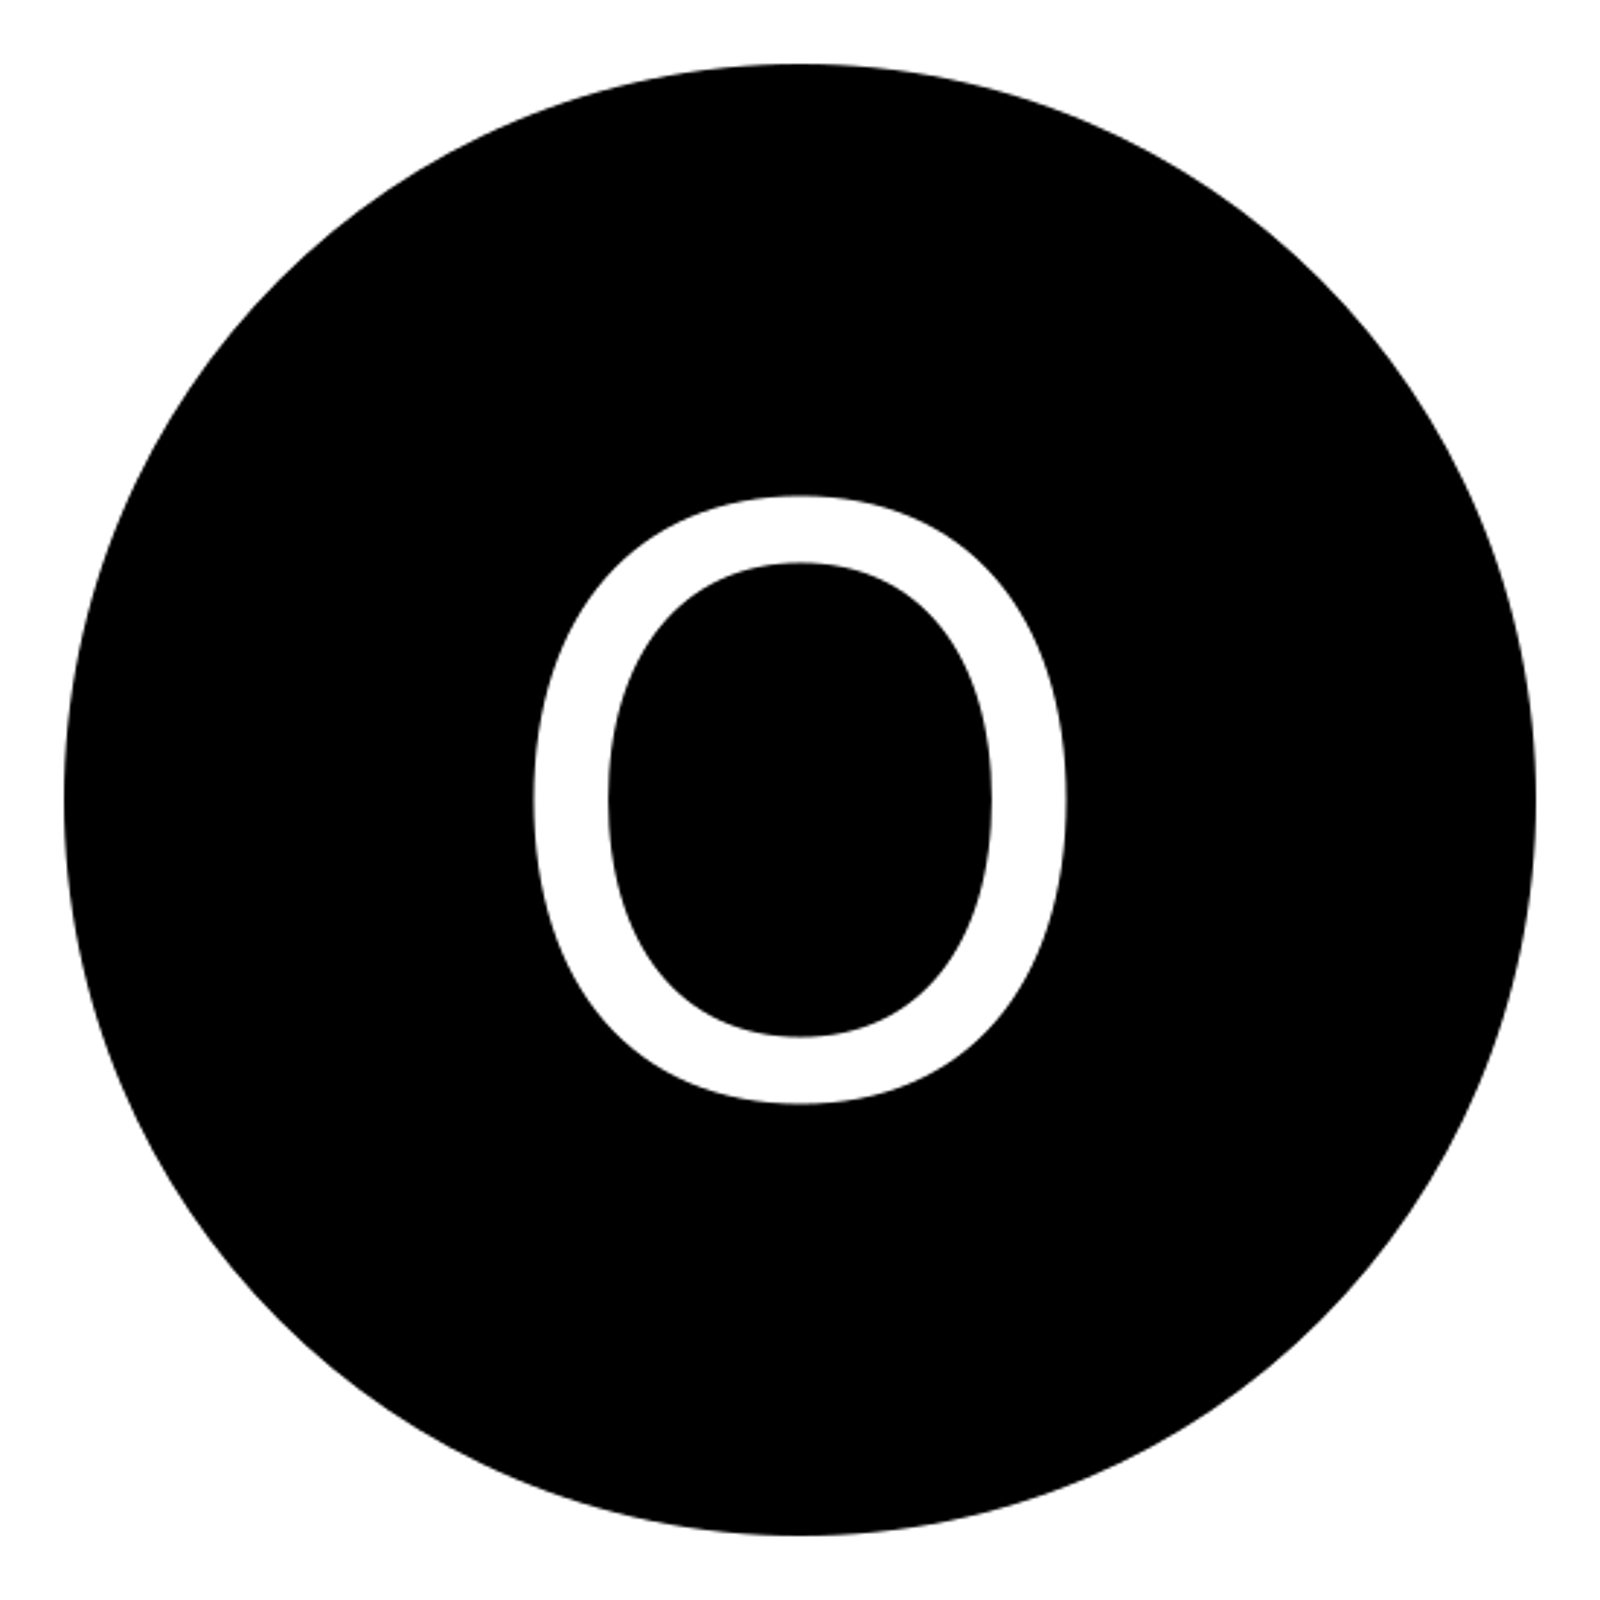 Circled O Filled icon